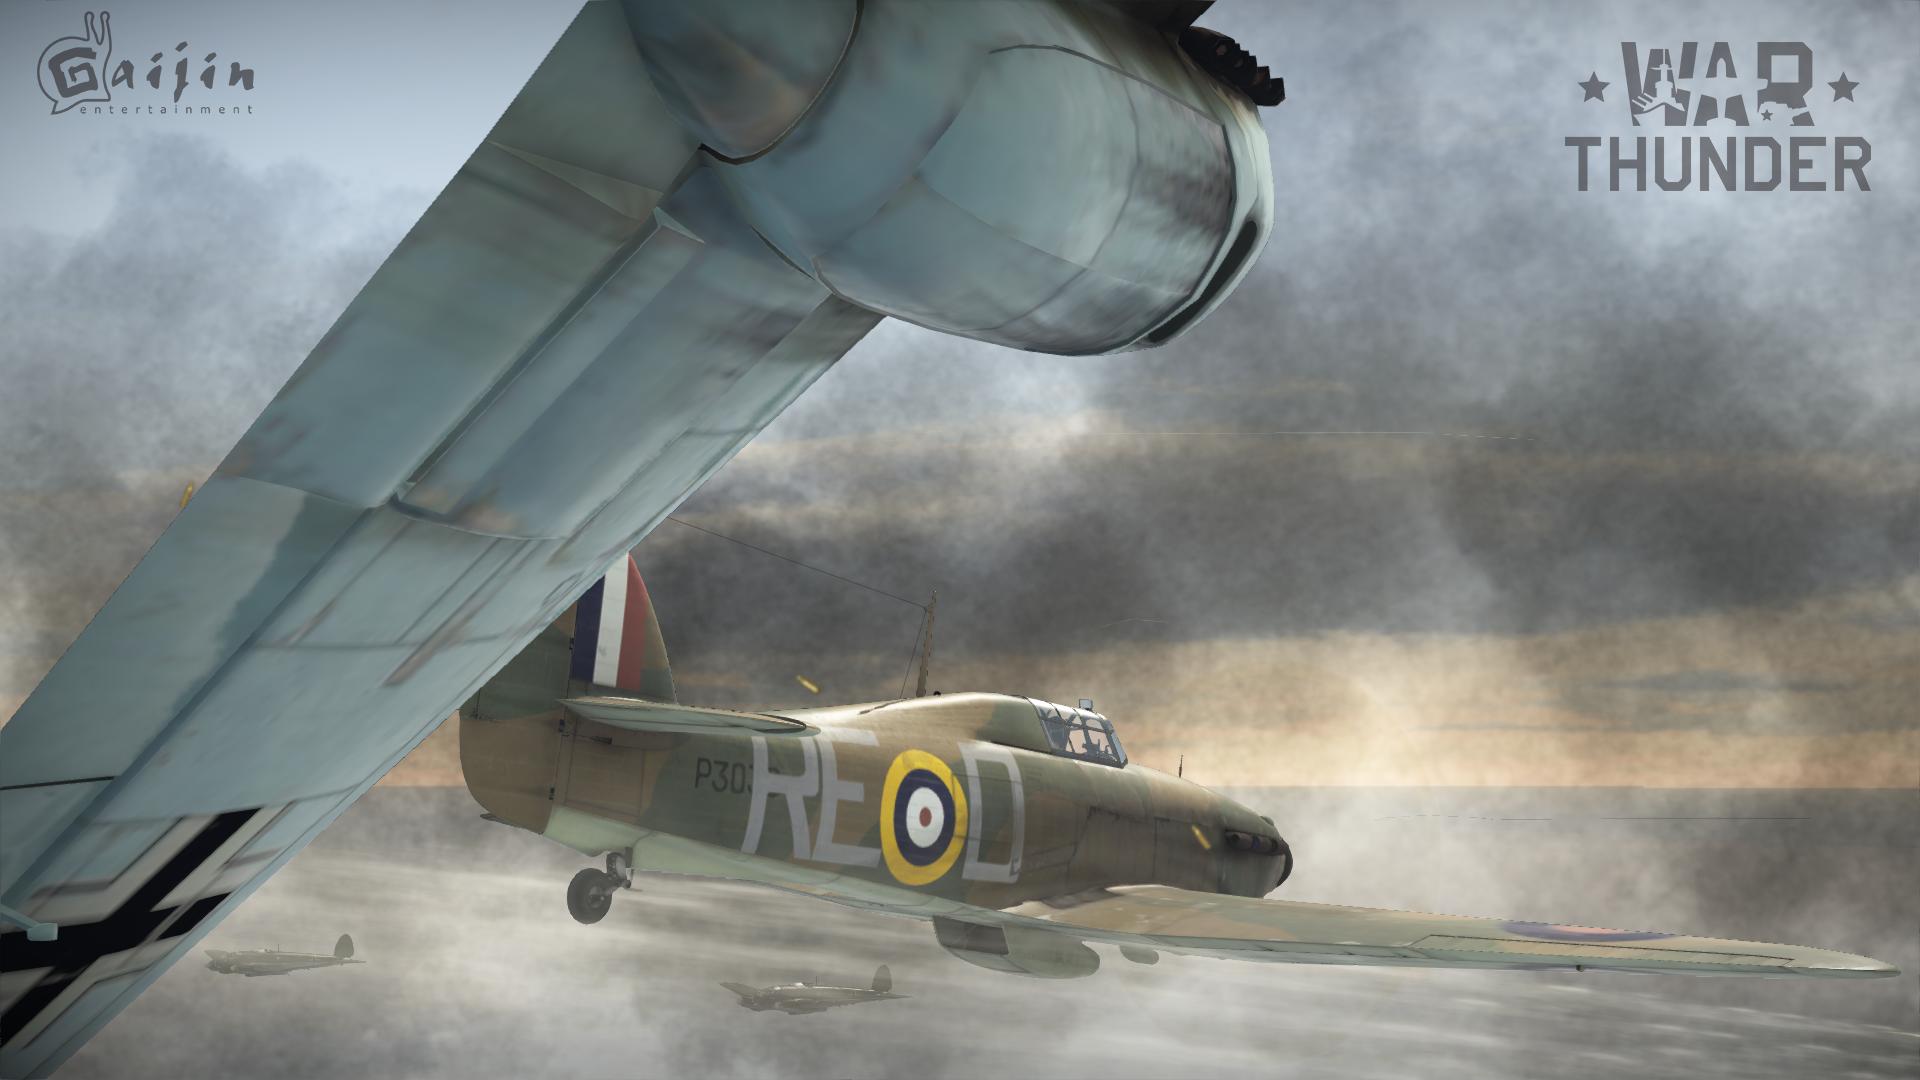 Battle+of+Britain+Hurricane+Mk.I+RE-D+P3